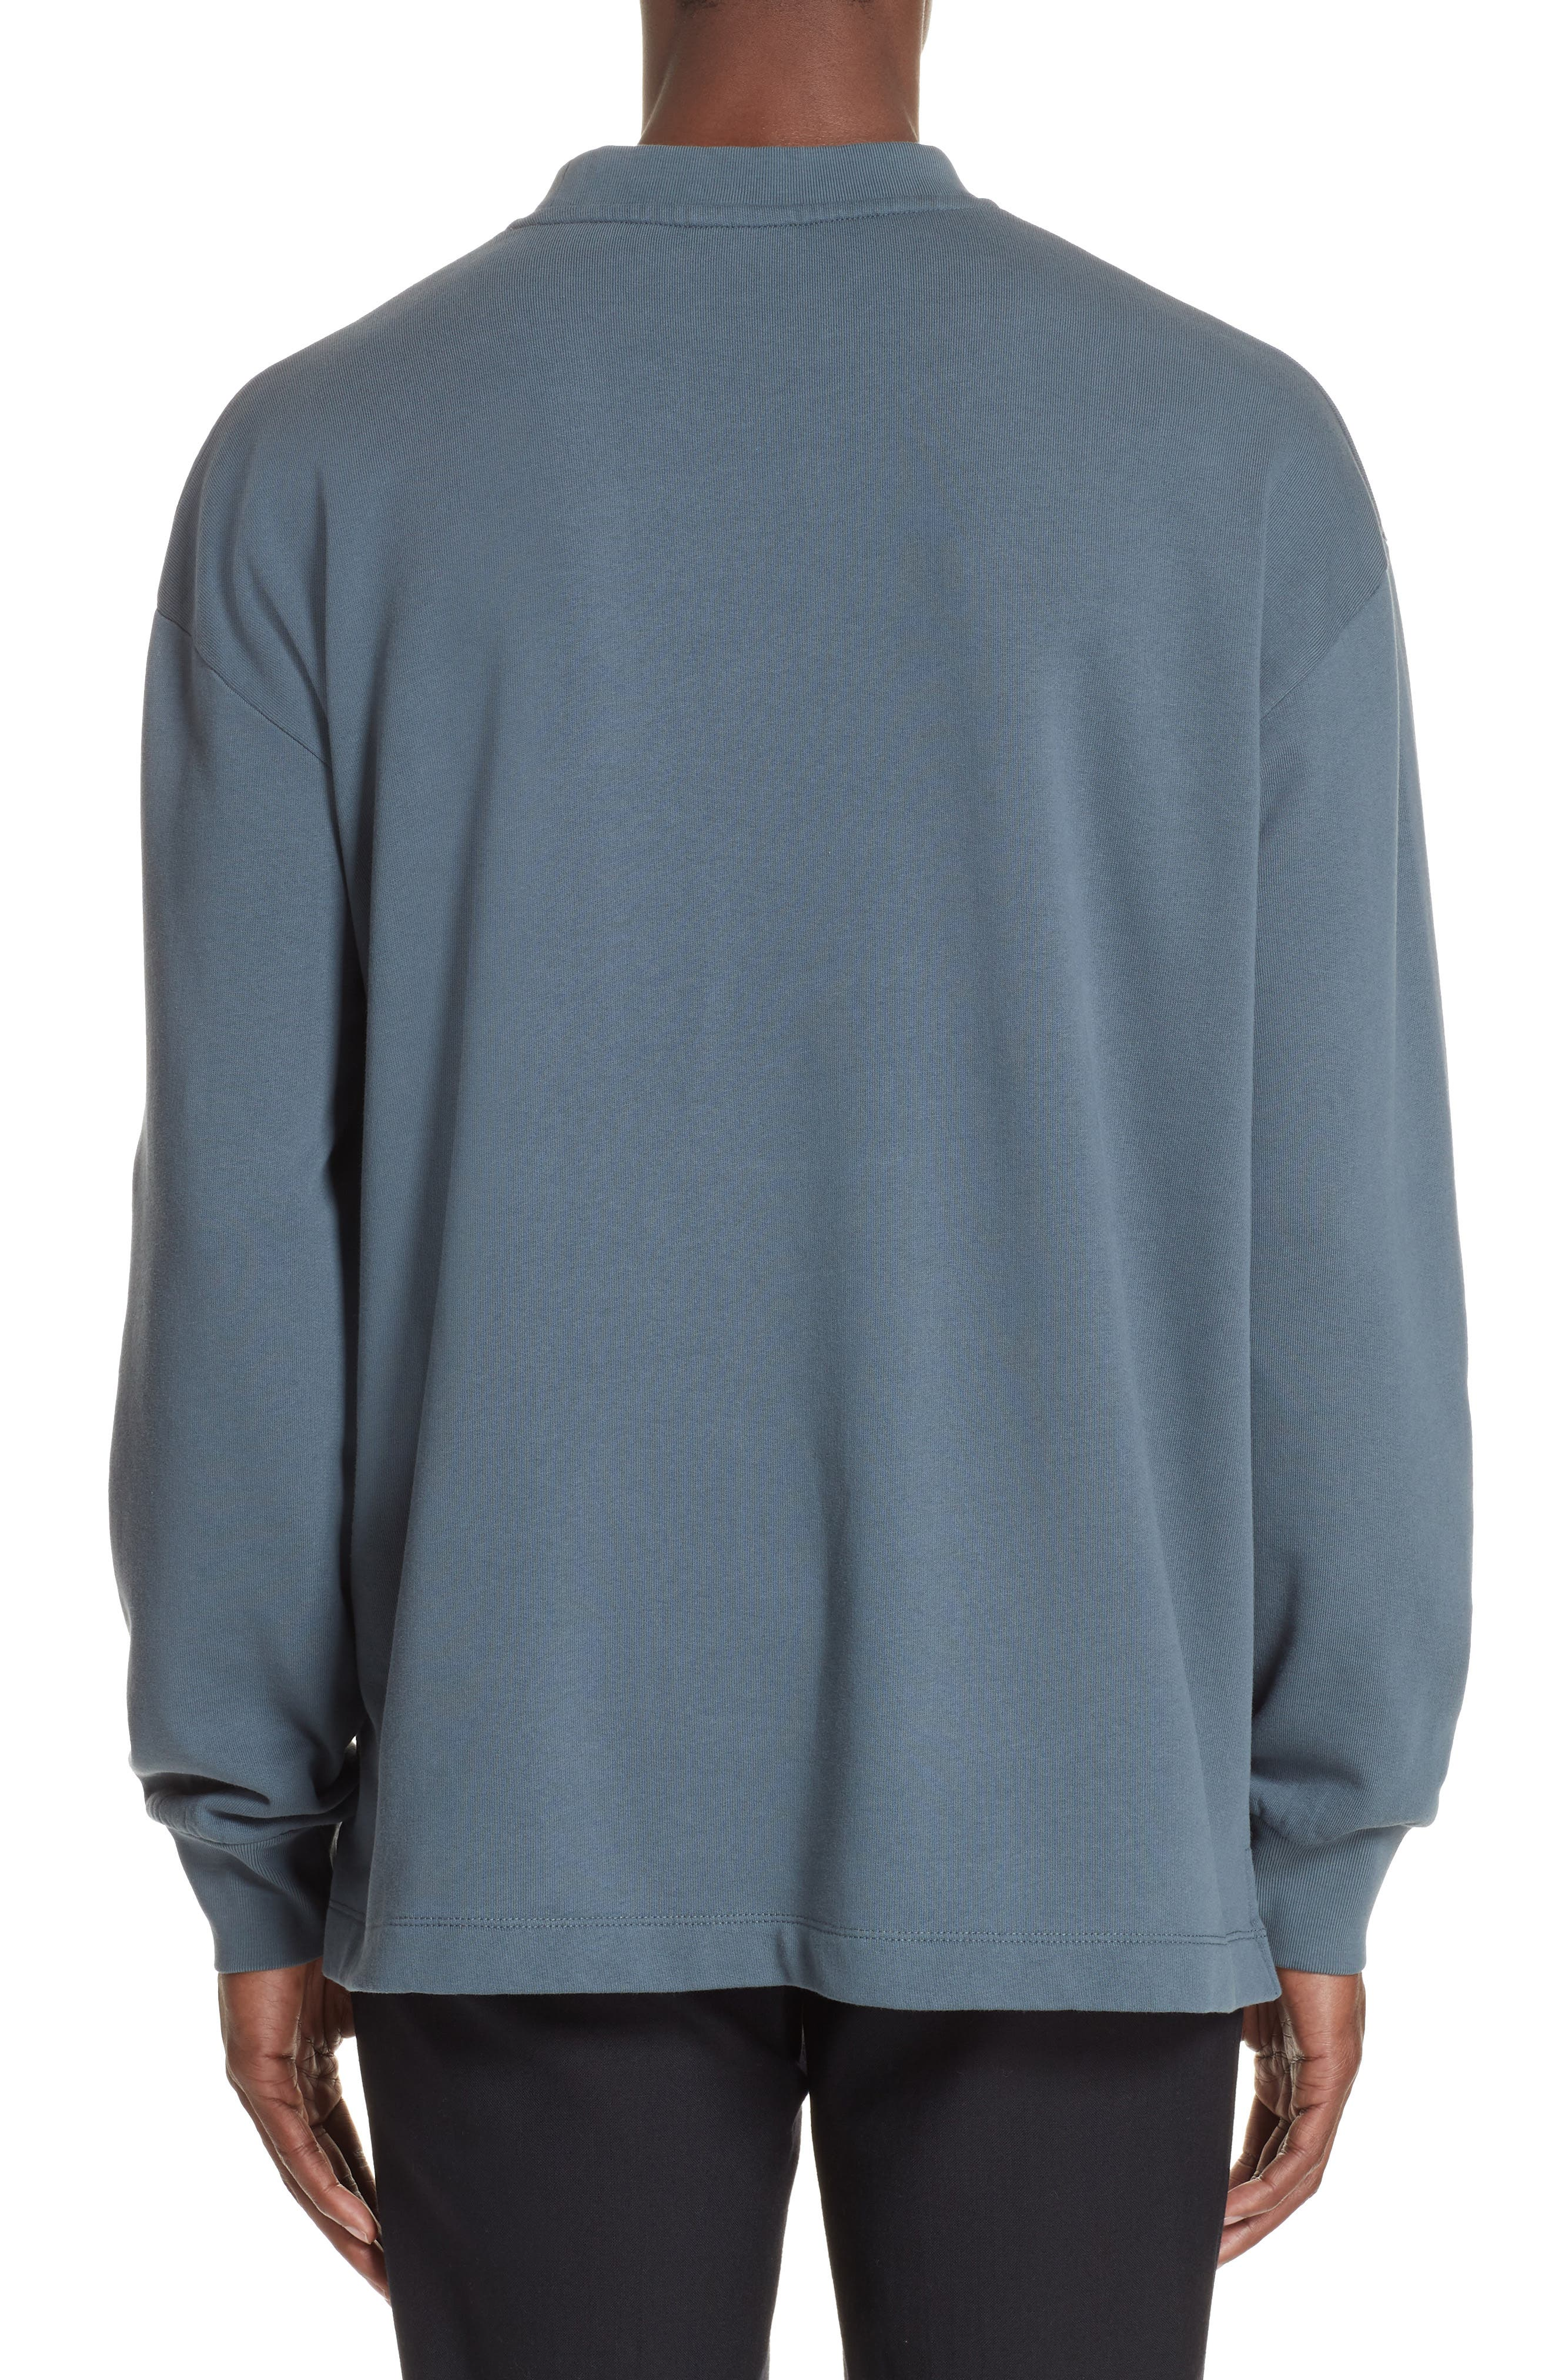 Fleece Knit Sweatshirt,                             Alternate thumbnail 2, color,                             GREY